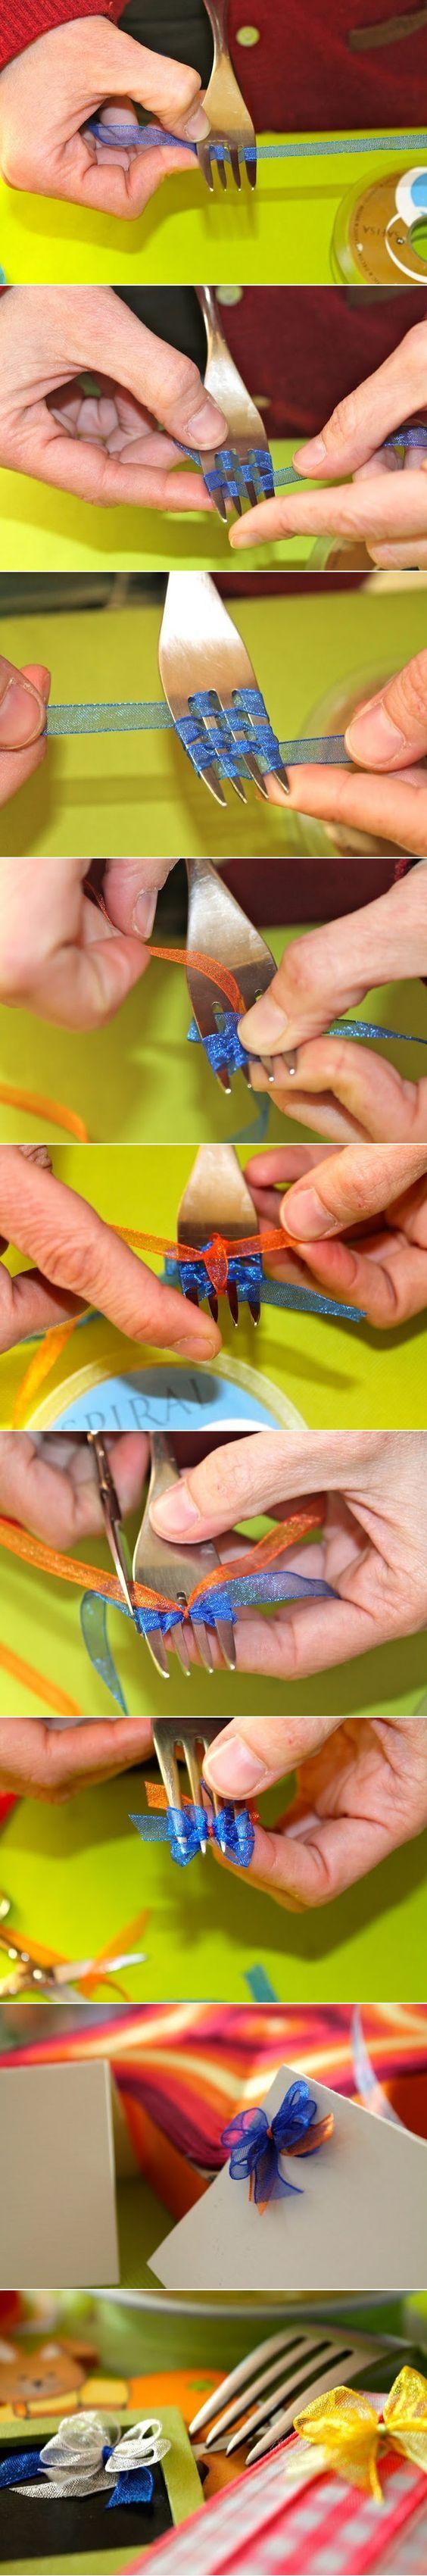 Mini lazos de tul con tenedor